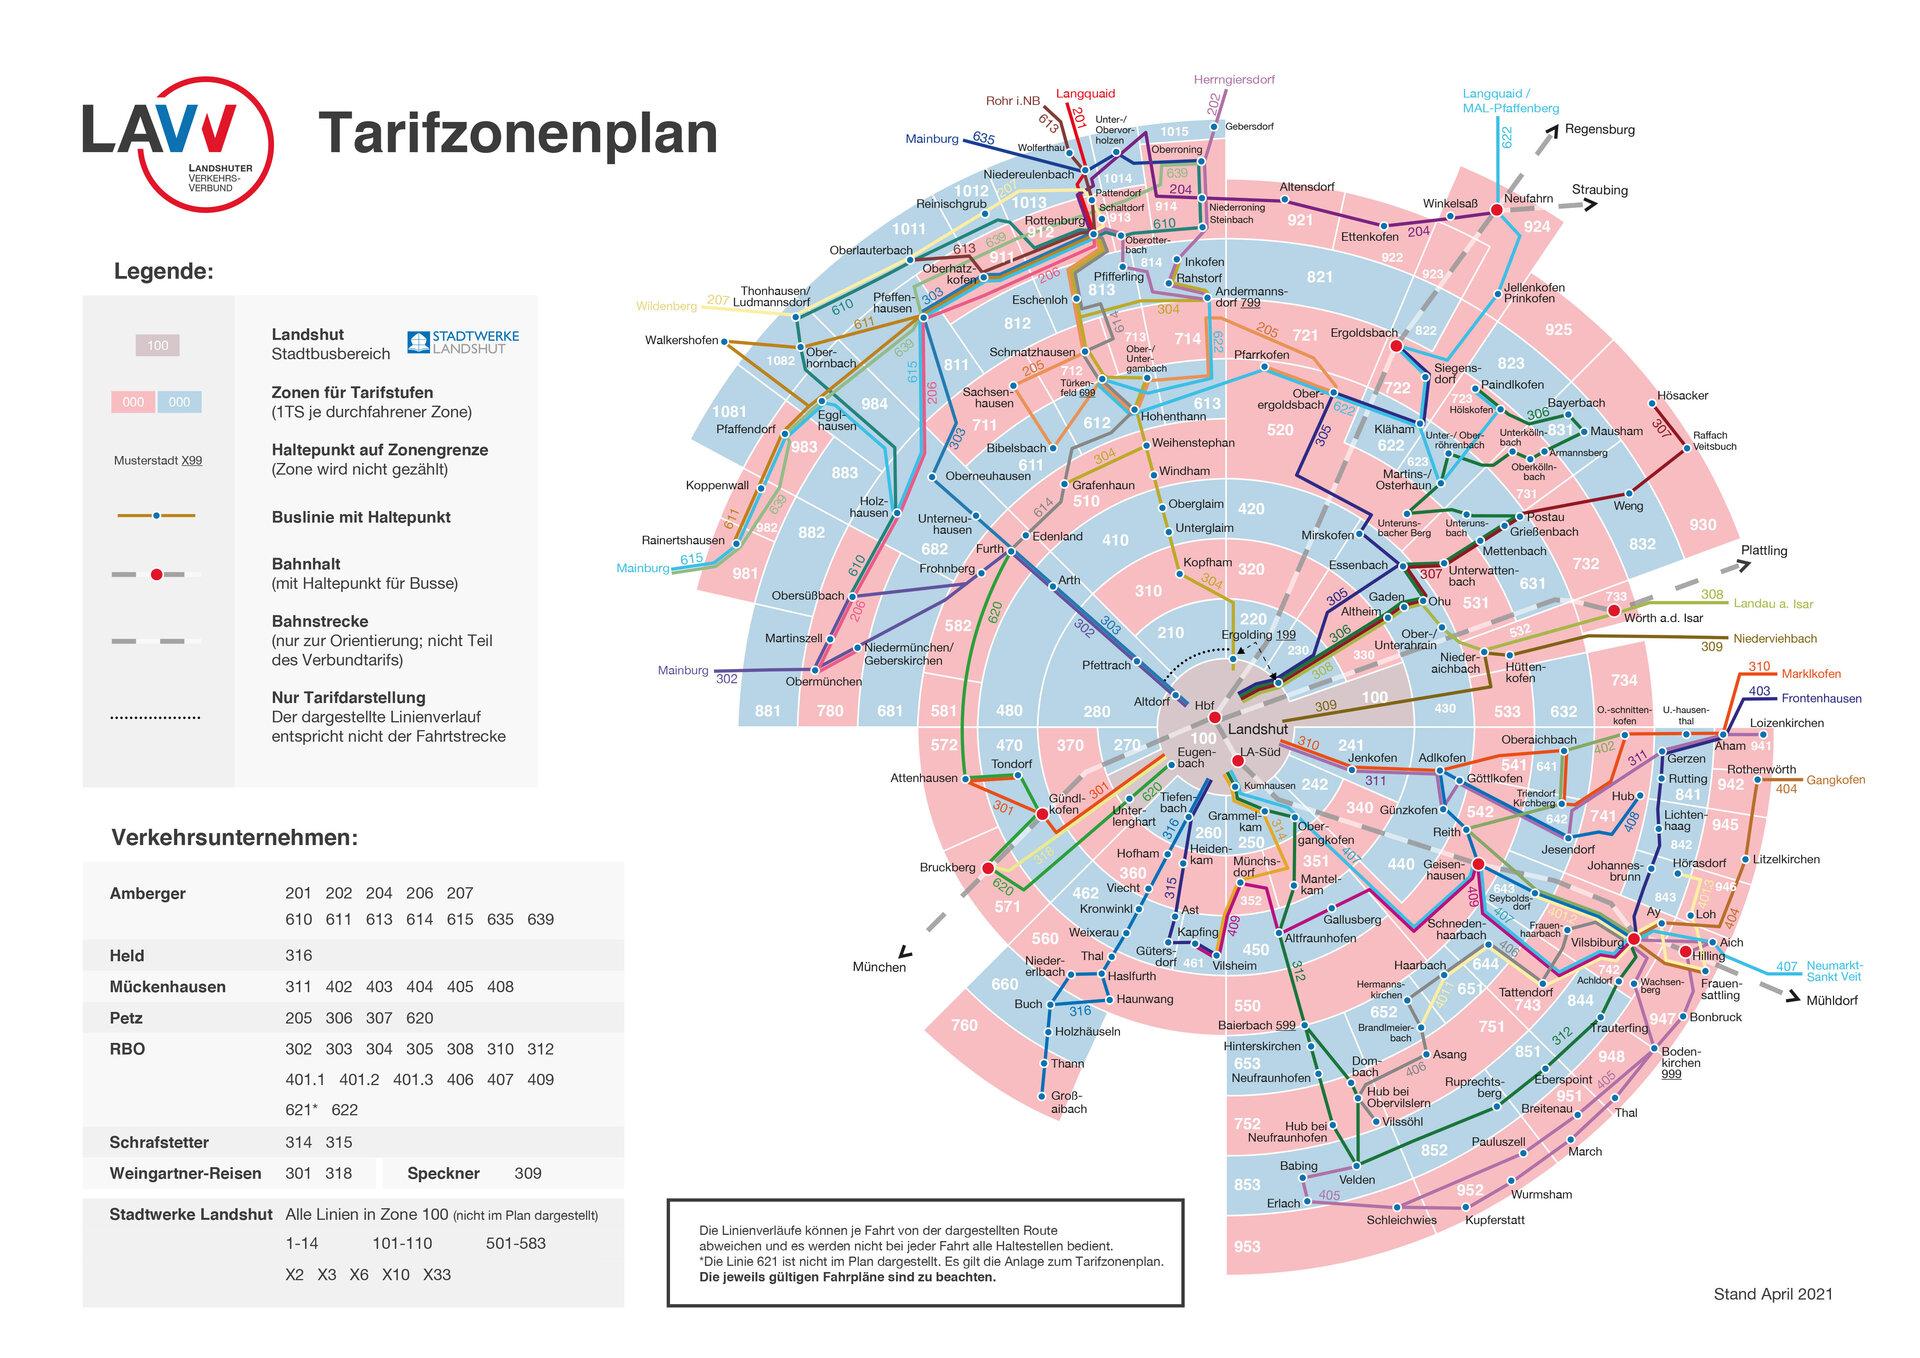 LAVV Tarifzonenplan April 2021